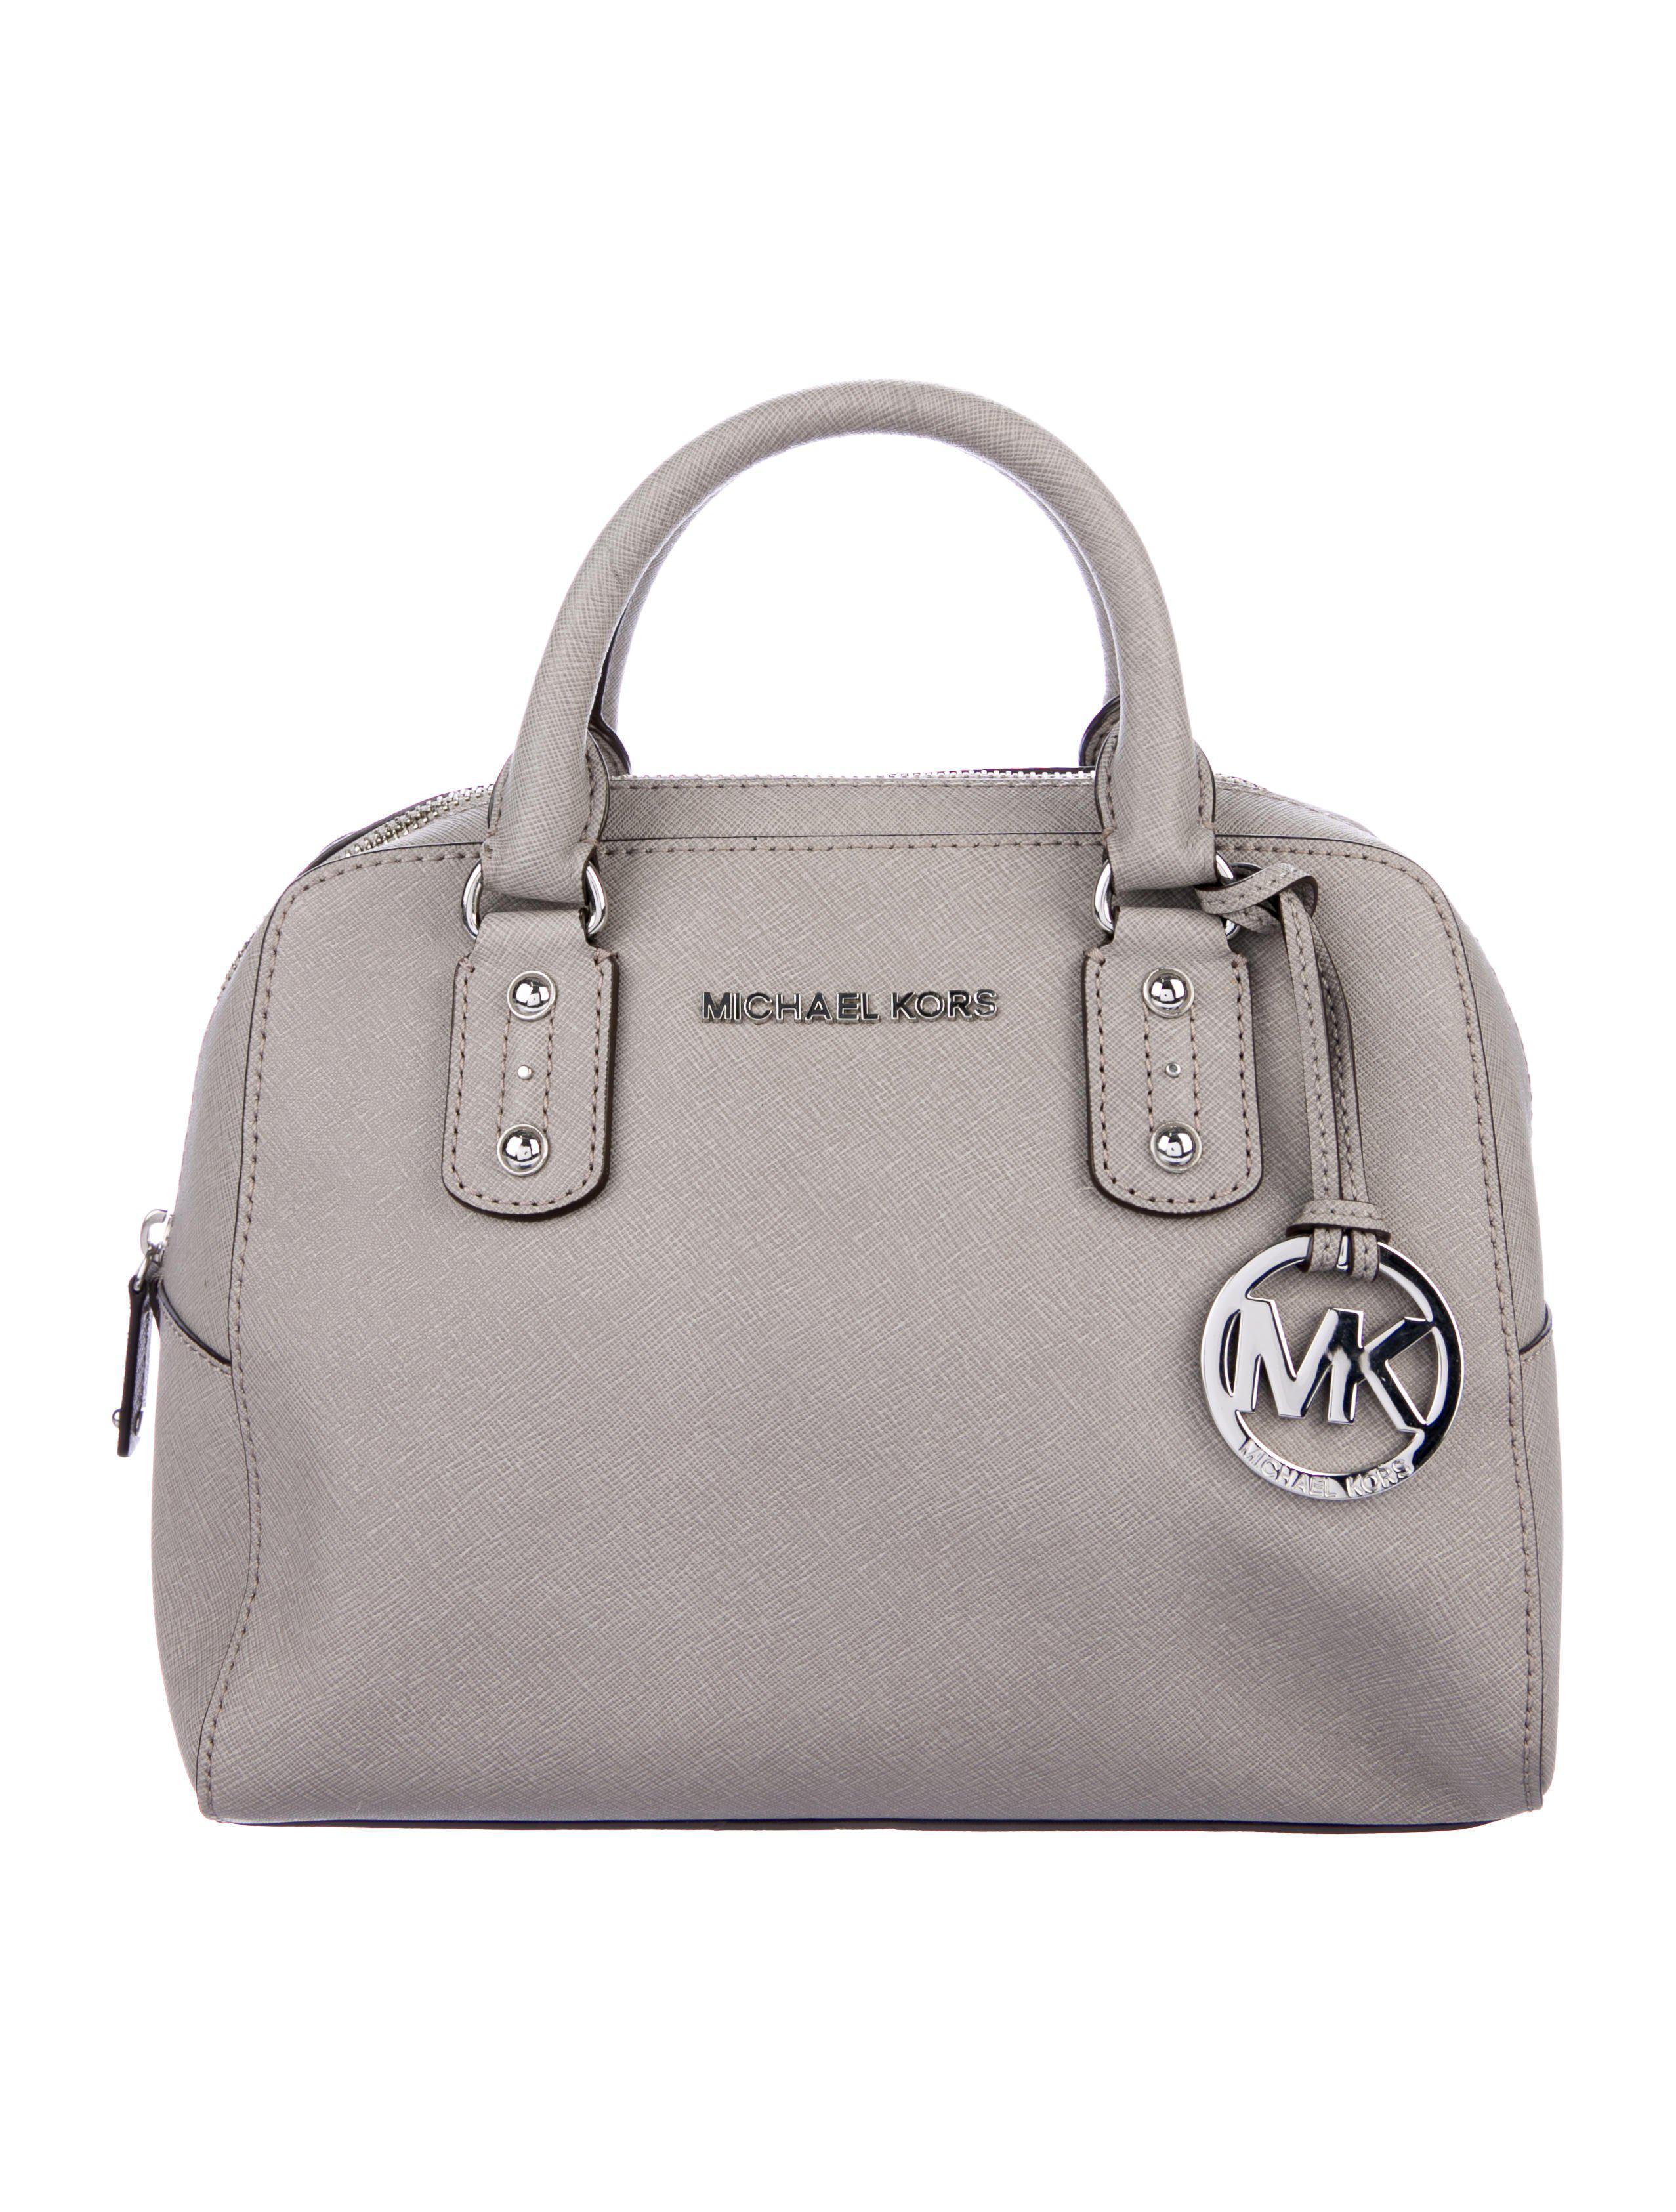 61cce3f164f9 MICHAEL Michael Kors. Women s Metallic Michael Kors Saffiano Leather Satchel  Grey